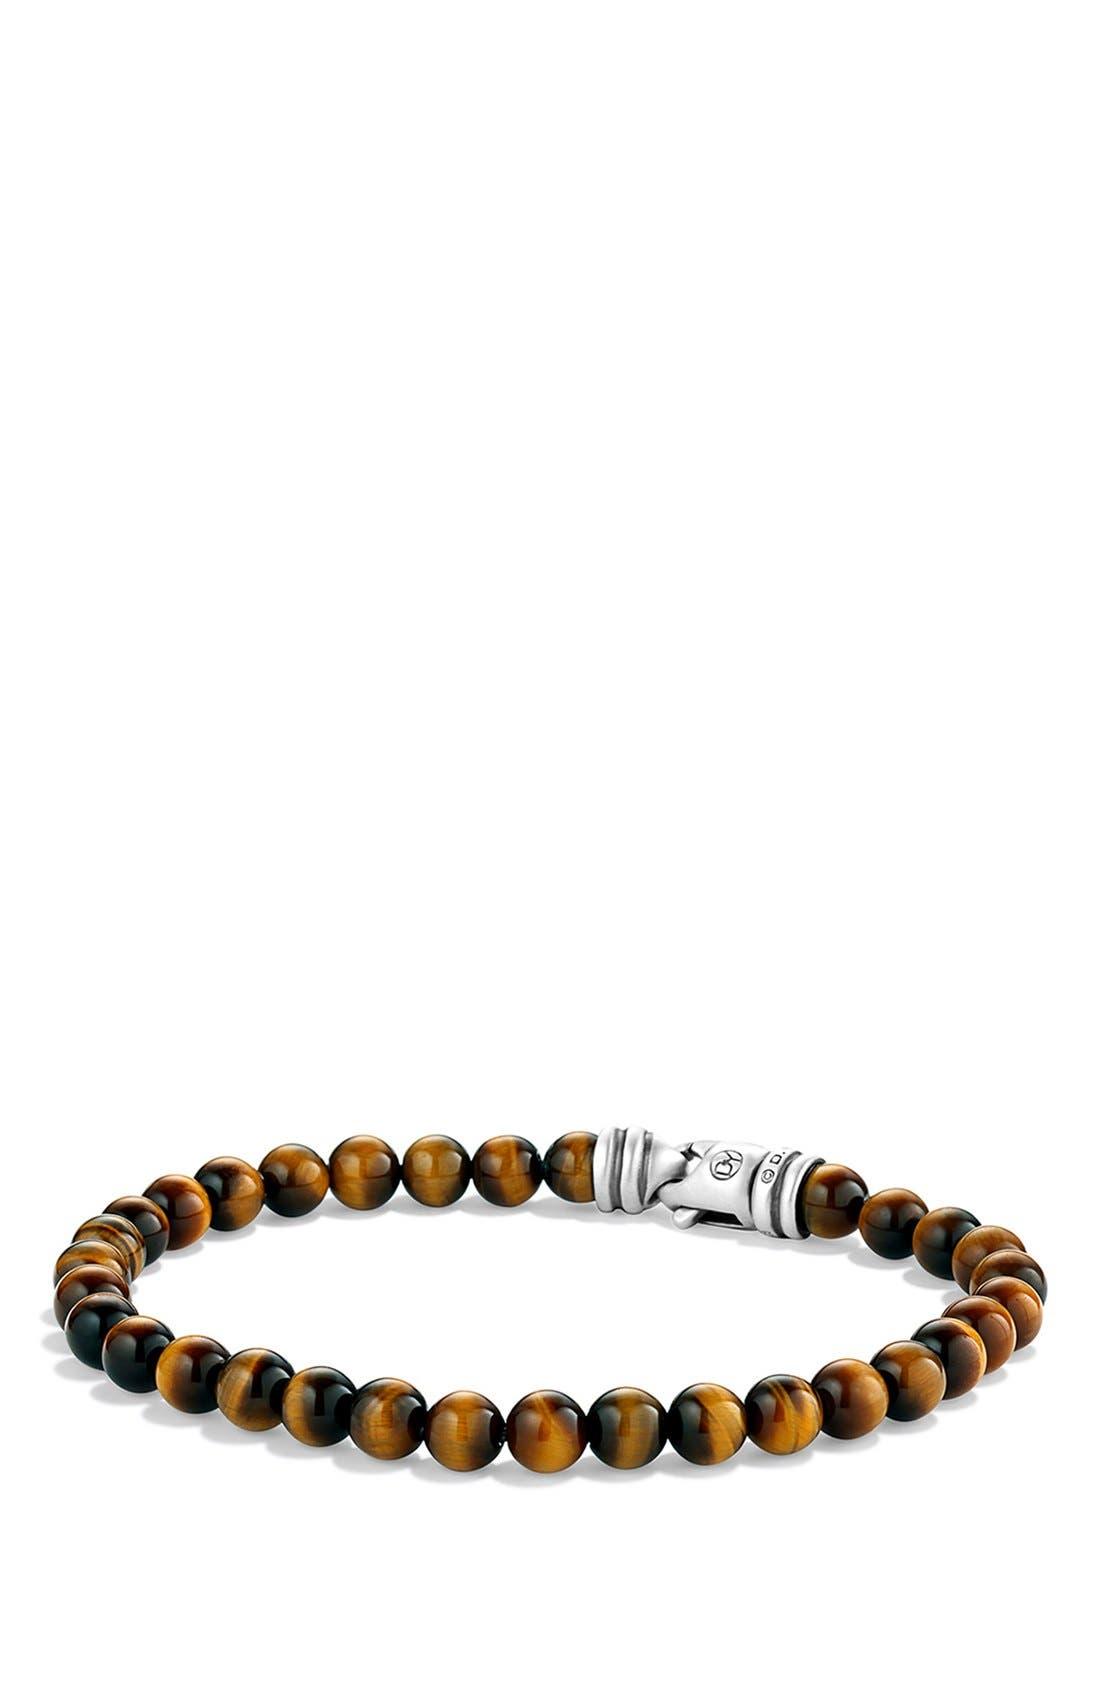 Alternate Image 1 Selected - David Yurman 'Spiritual Beads' Bracelet